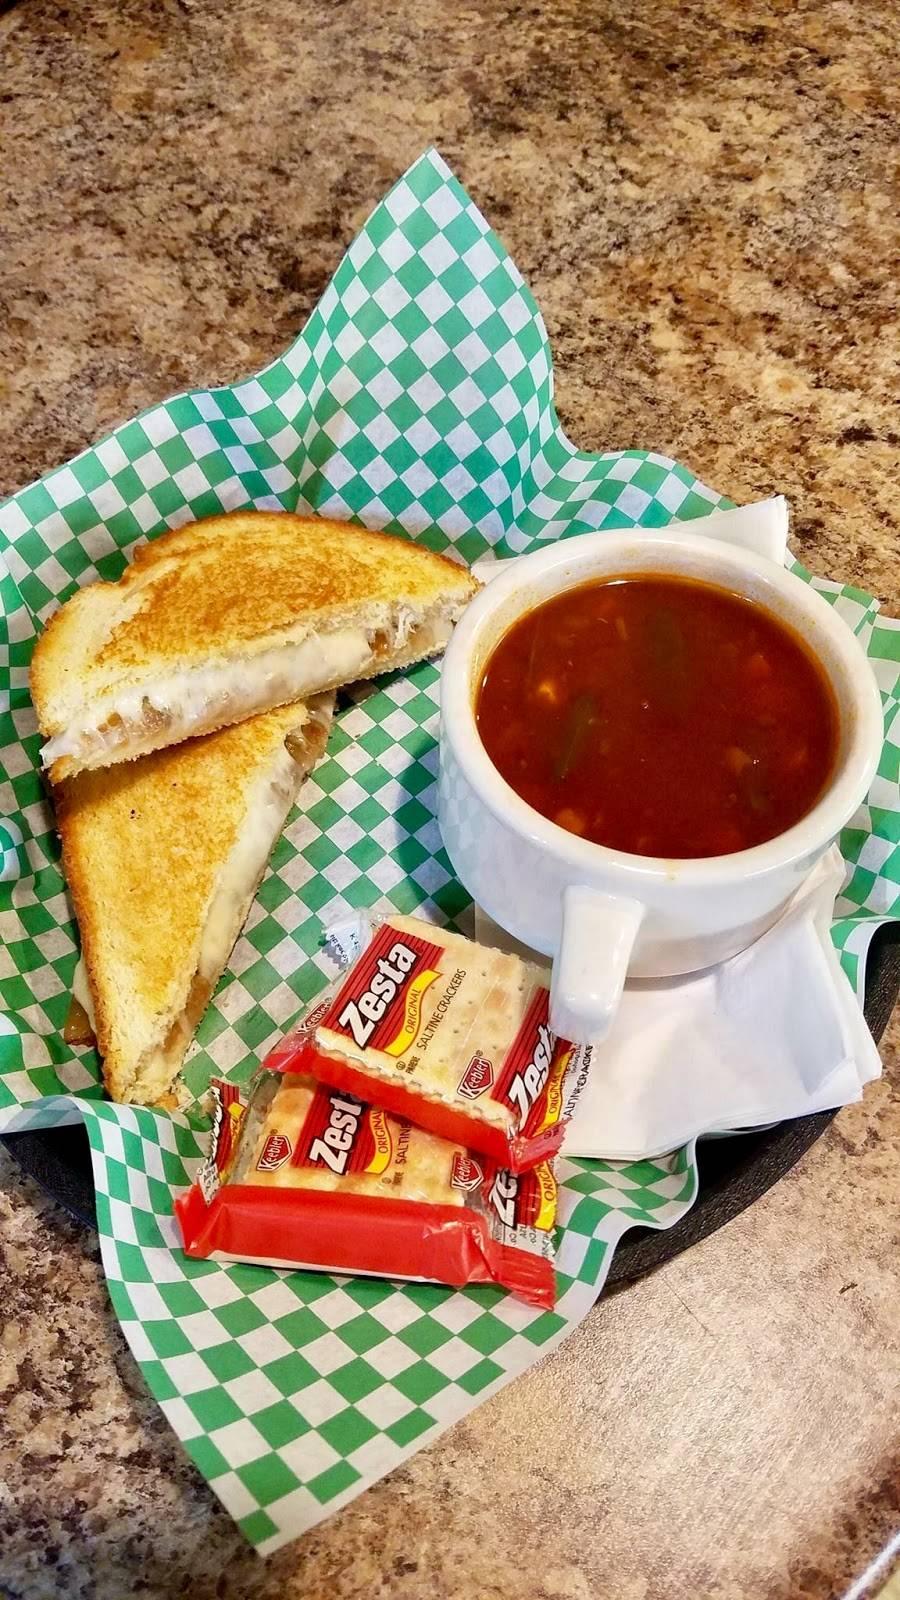 Lil Moes | restaurant | 23 N Main St, Philippi, WV 26416, USA | 3044572680 OR +1 304-457-2680